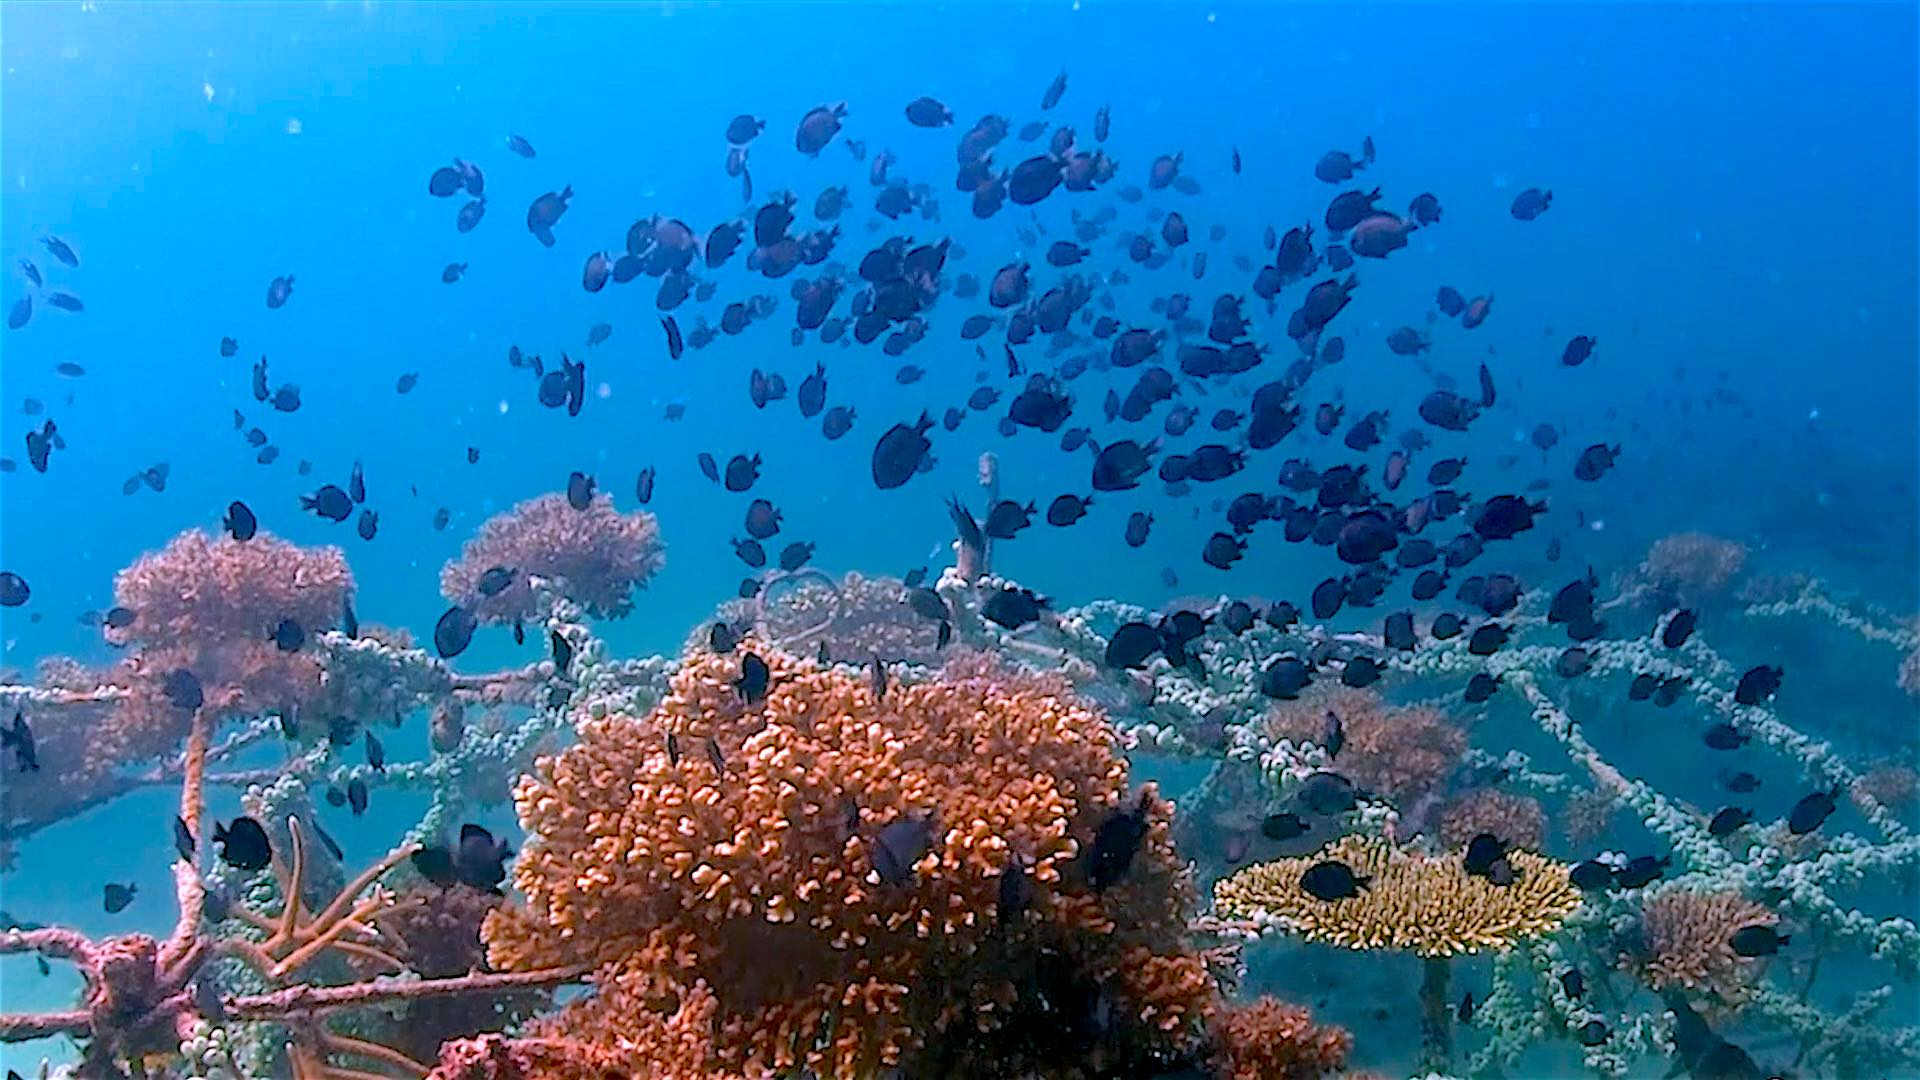 www.thefunkyturtle.com junkyard reef artificial dive site koh tao